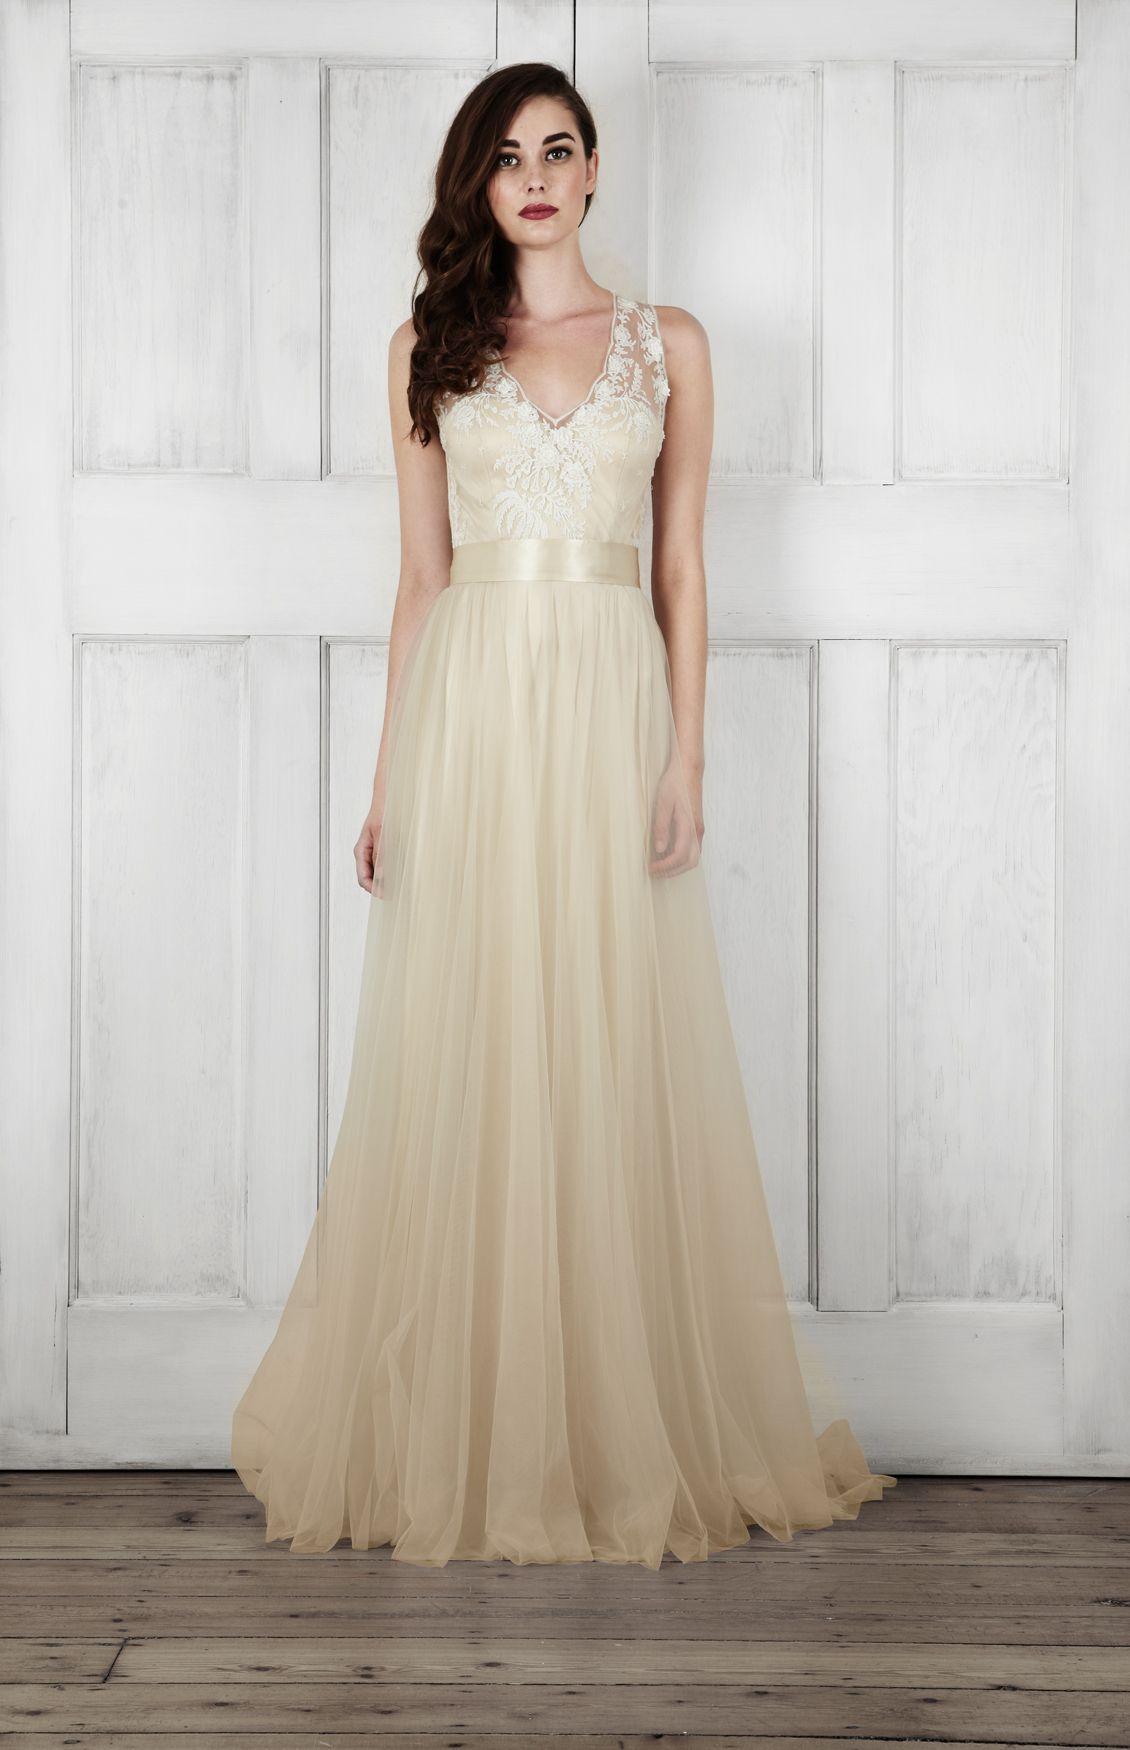 colourful | Catherine deane wedding dress, Champagne wedding ...